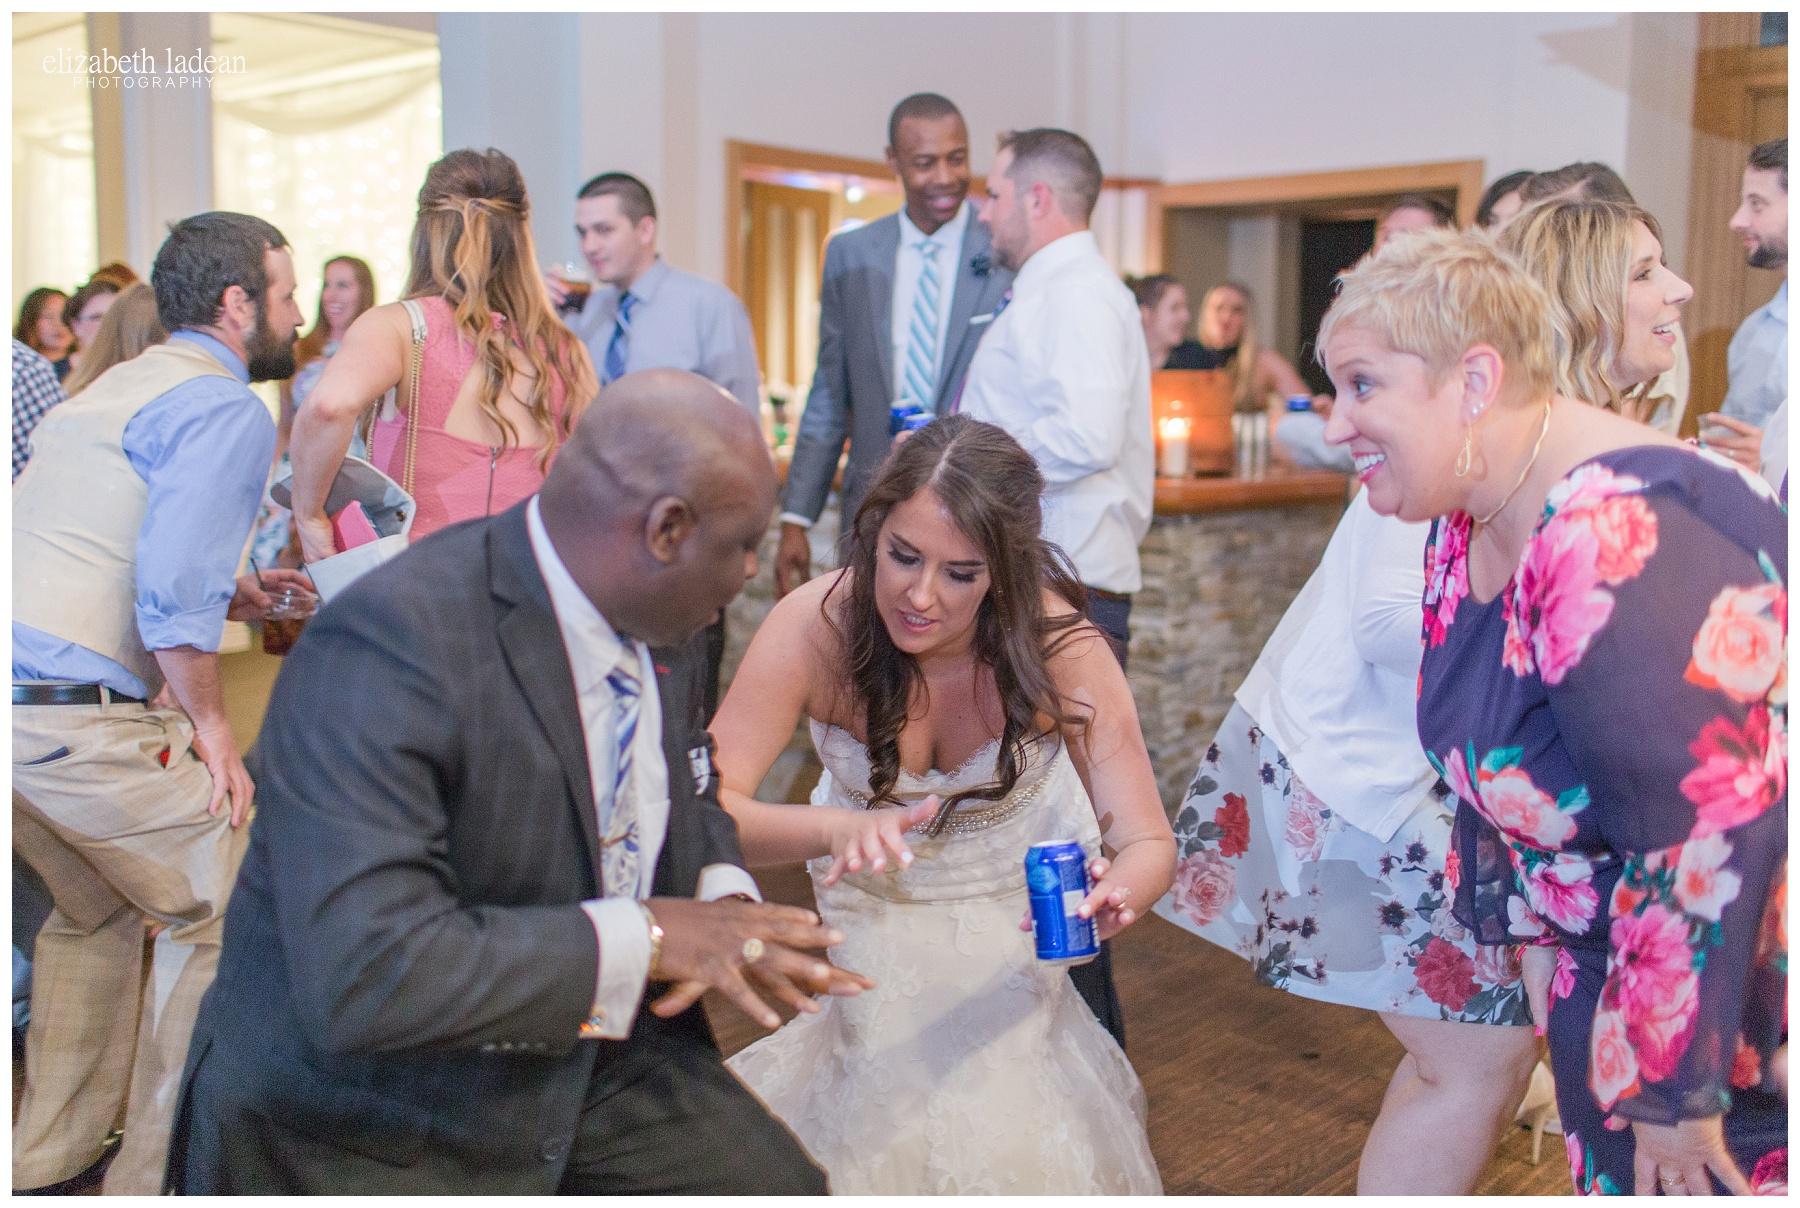 Hillcrest-Country-Club-Kansas-City-Wedding-Photography-E+J-0520-Elizabeth-Ladean-Photography-photo_0891.jpg